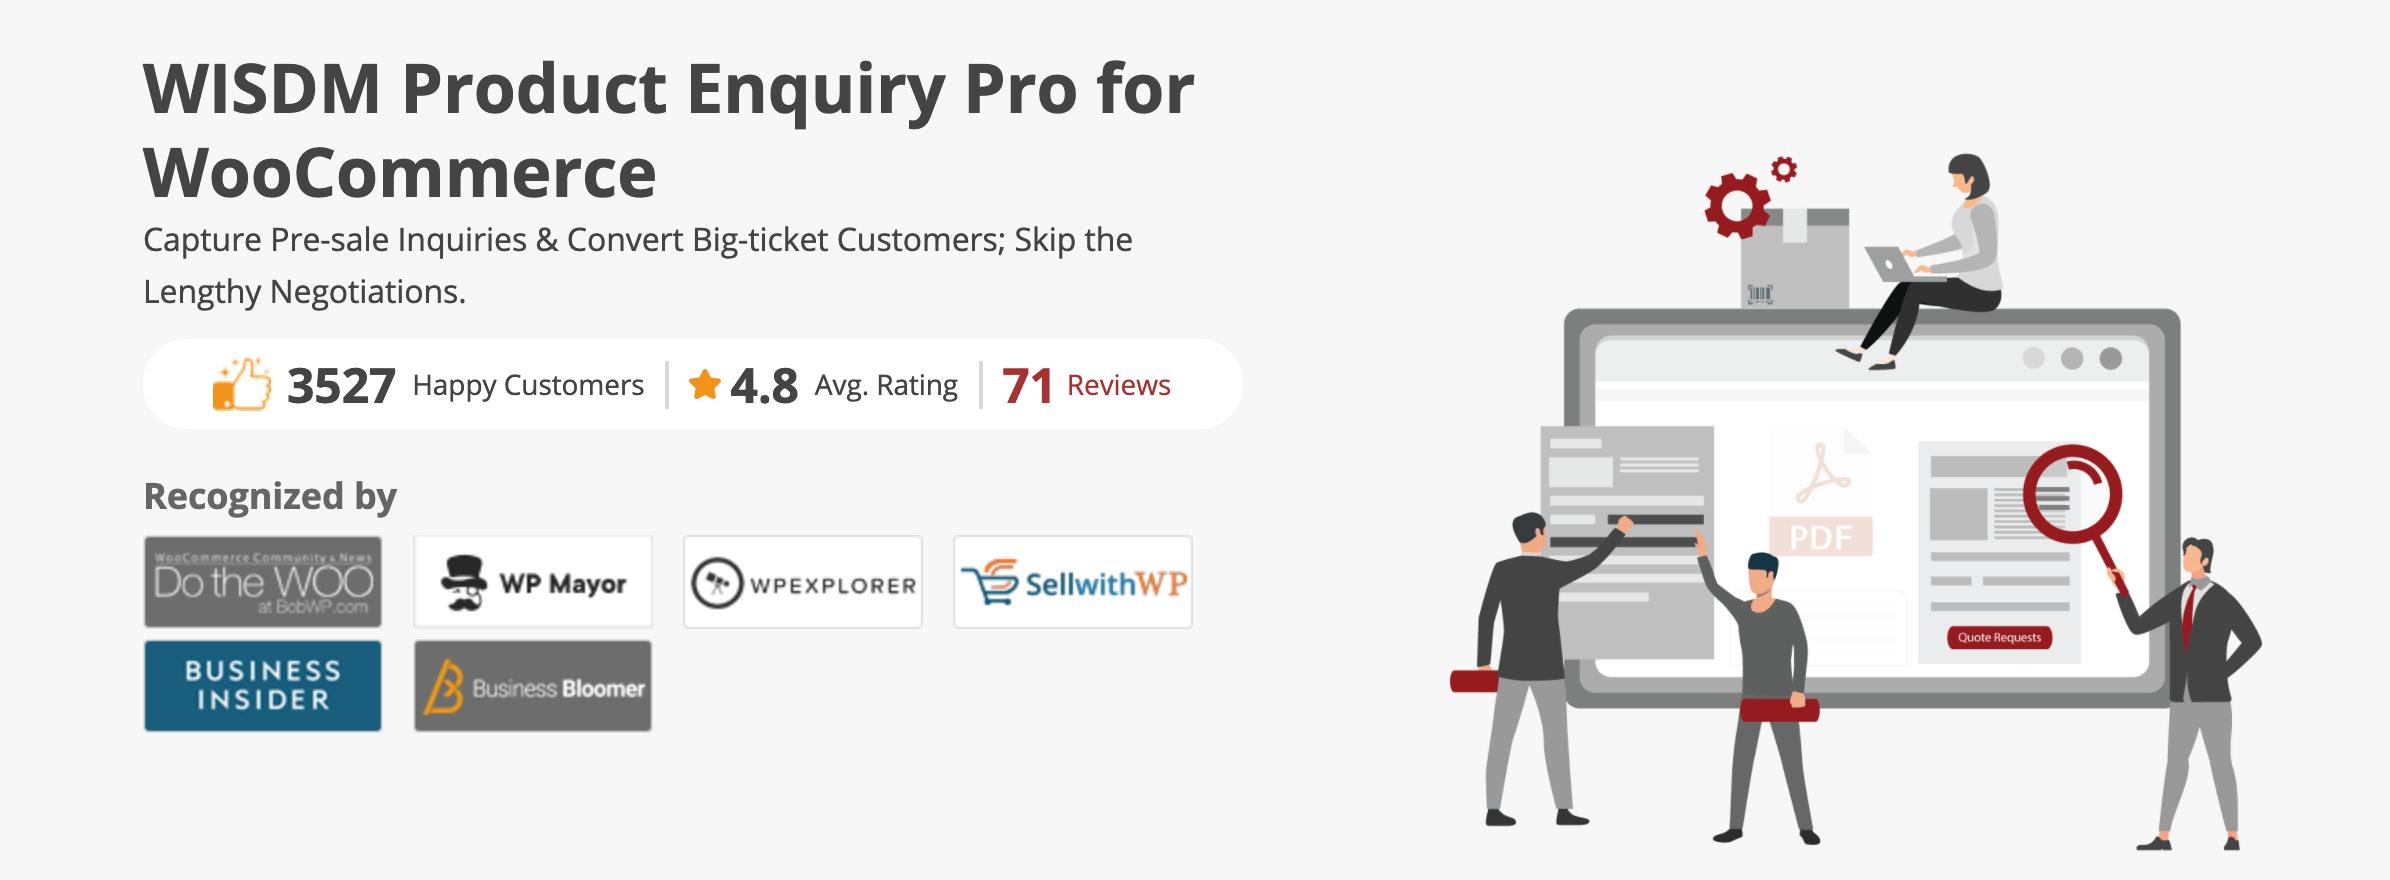 WISDM Product Enquiry Pro